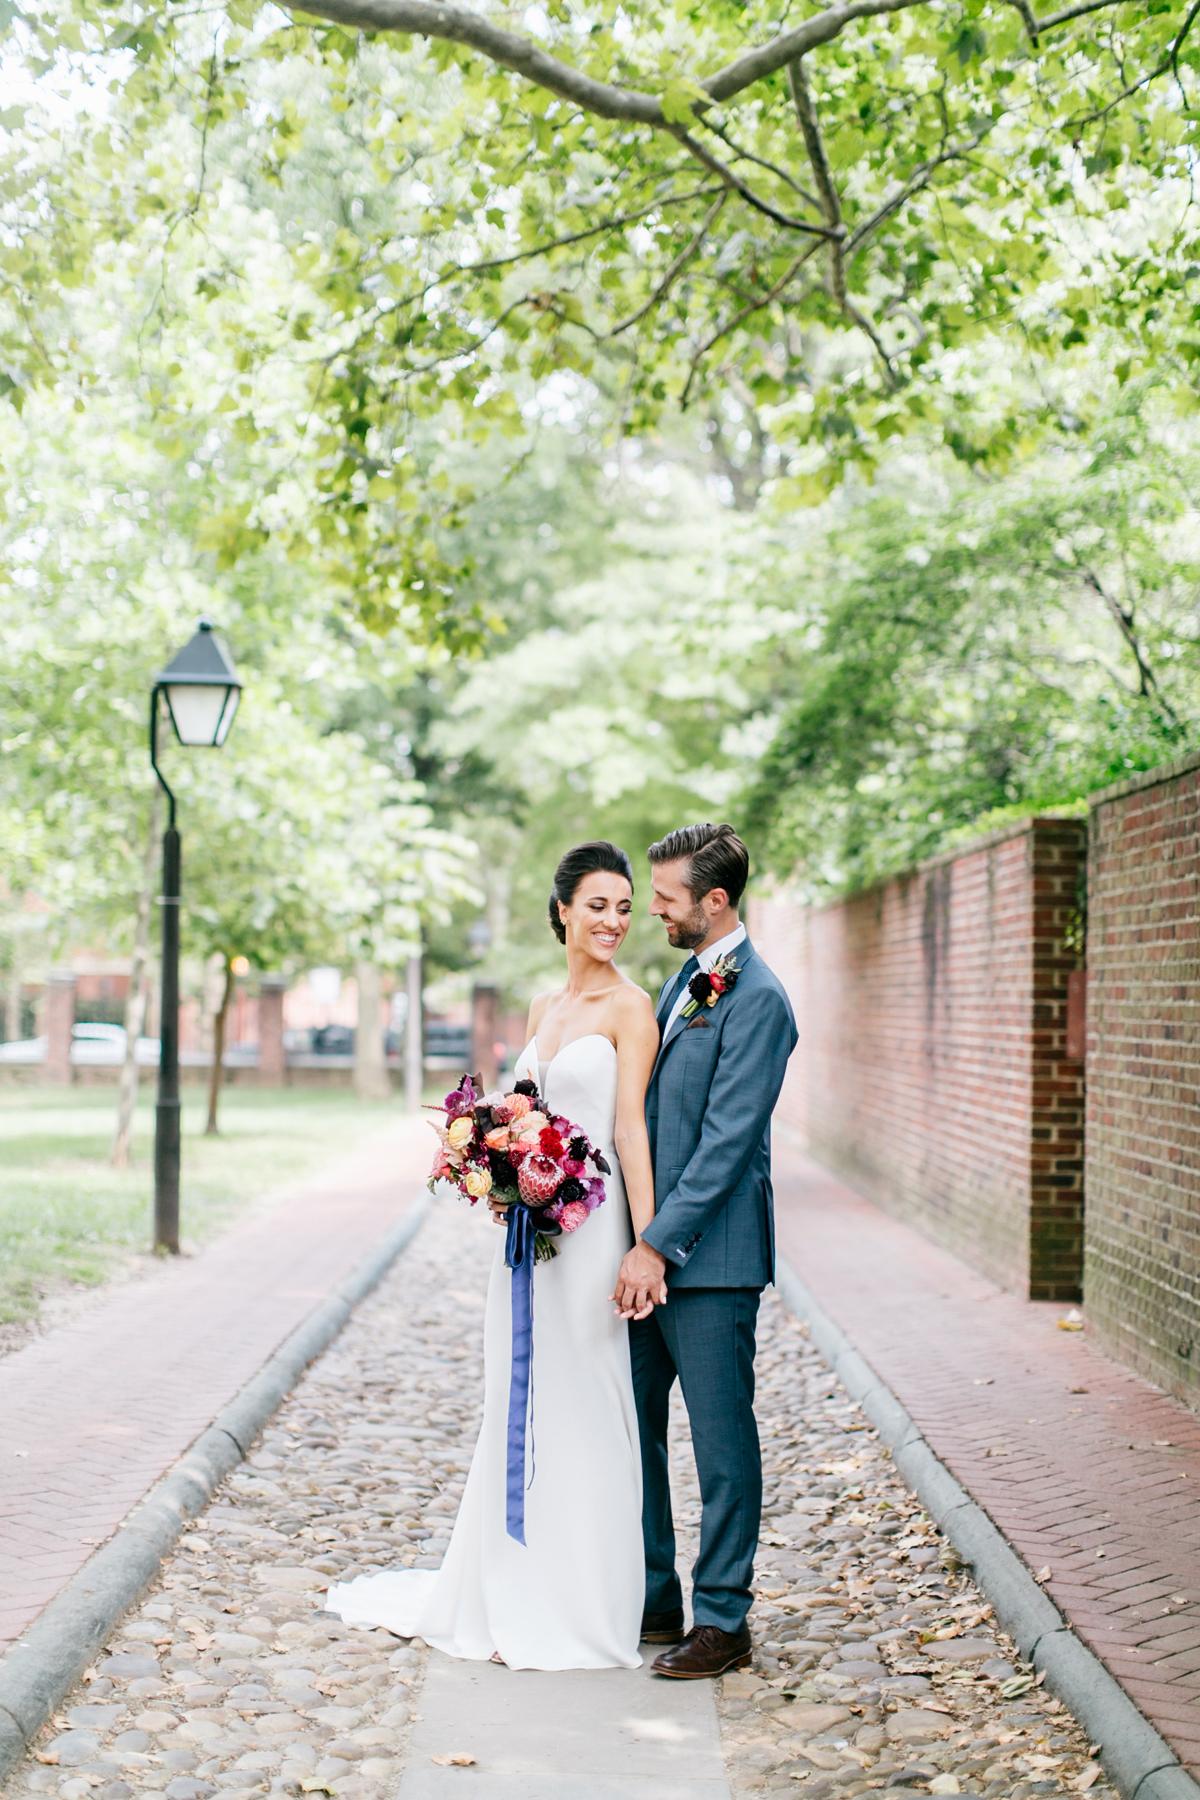 nicole-kevin-cira-center-garces-philadelphia-wedding030.jpg